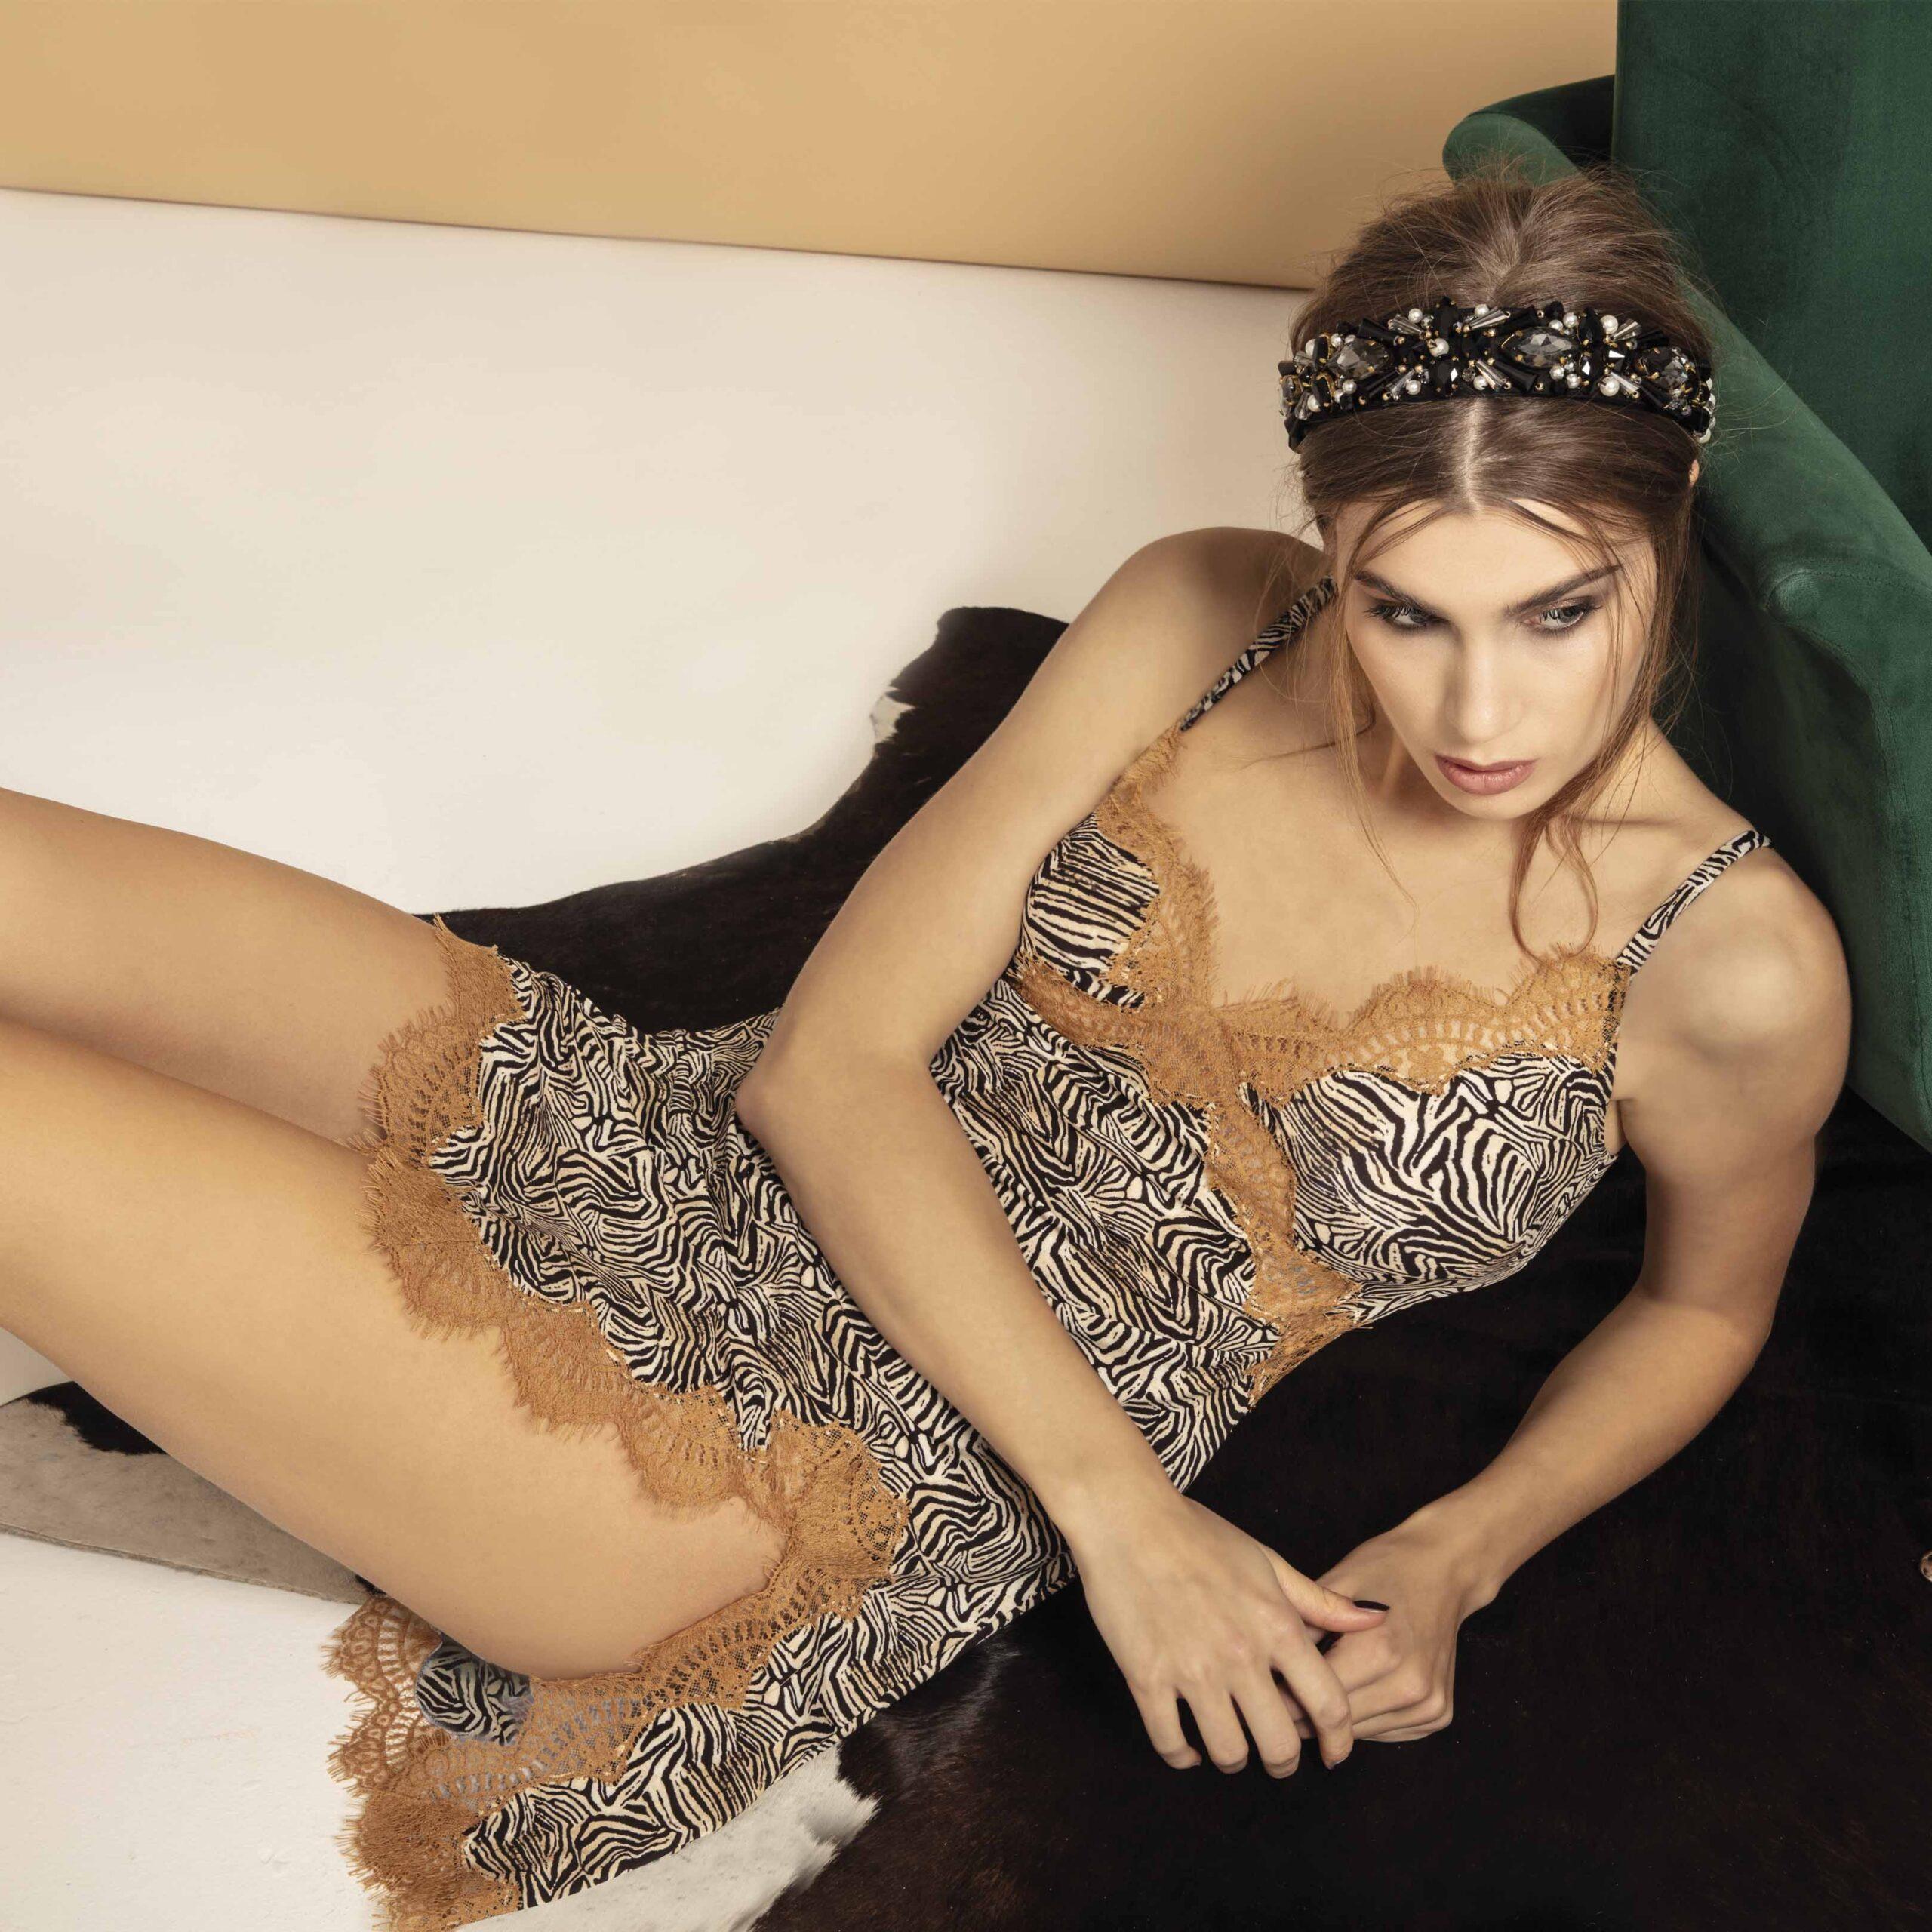 sottoveste-zebrata-valery-lingerie-biancheria-intima-donna-autunno-inverno-2022